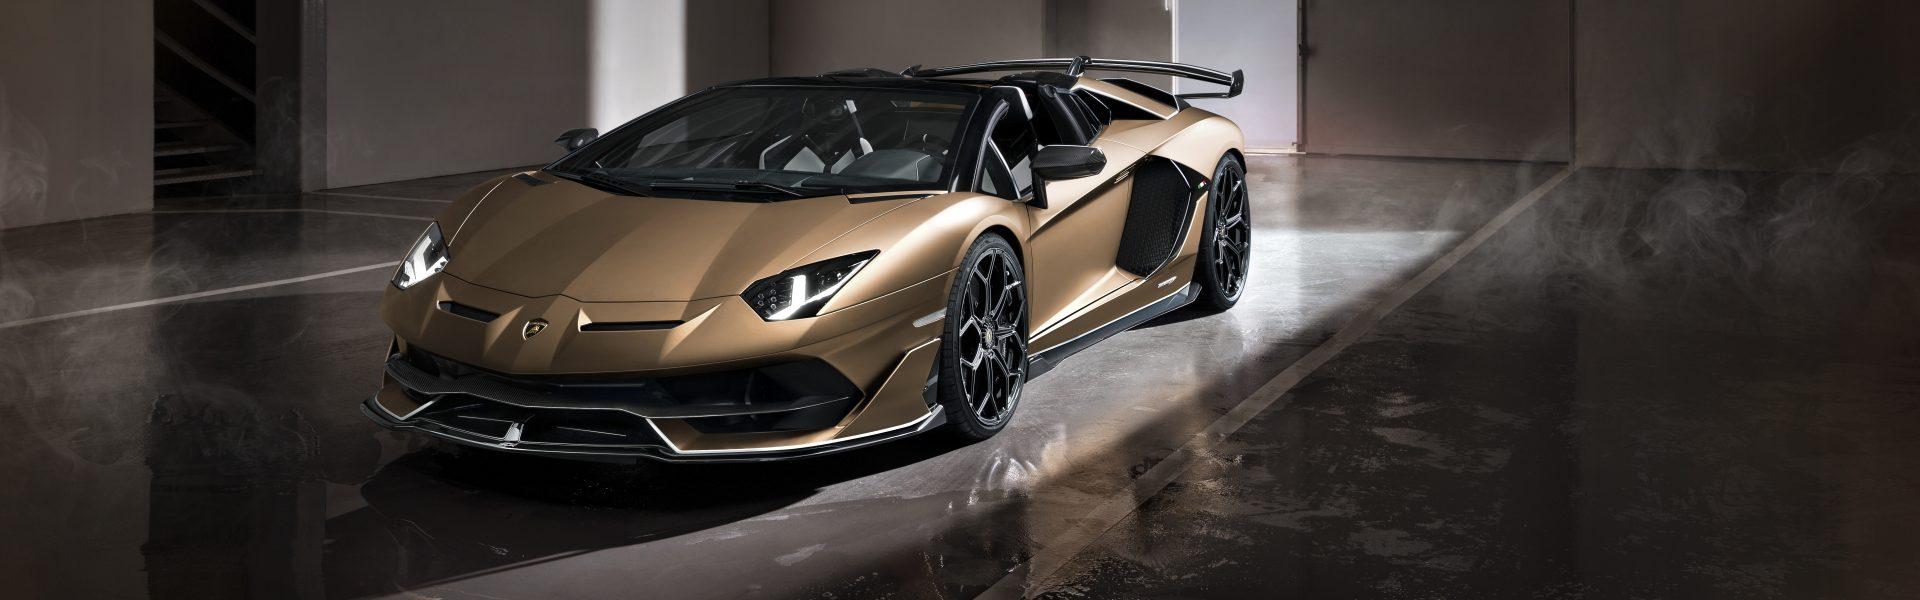 Lamborghini Aventador SVJ Roadster revealed